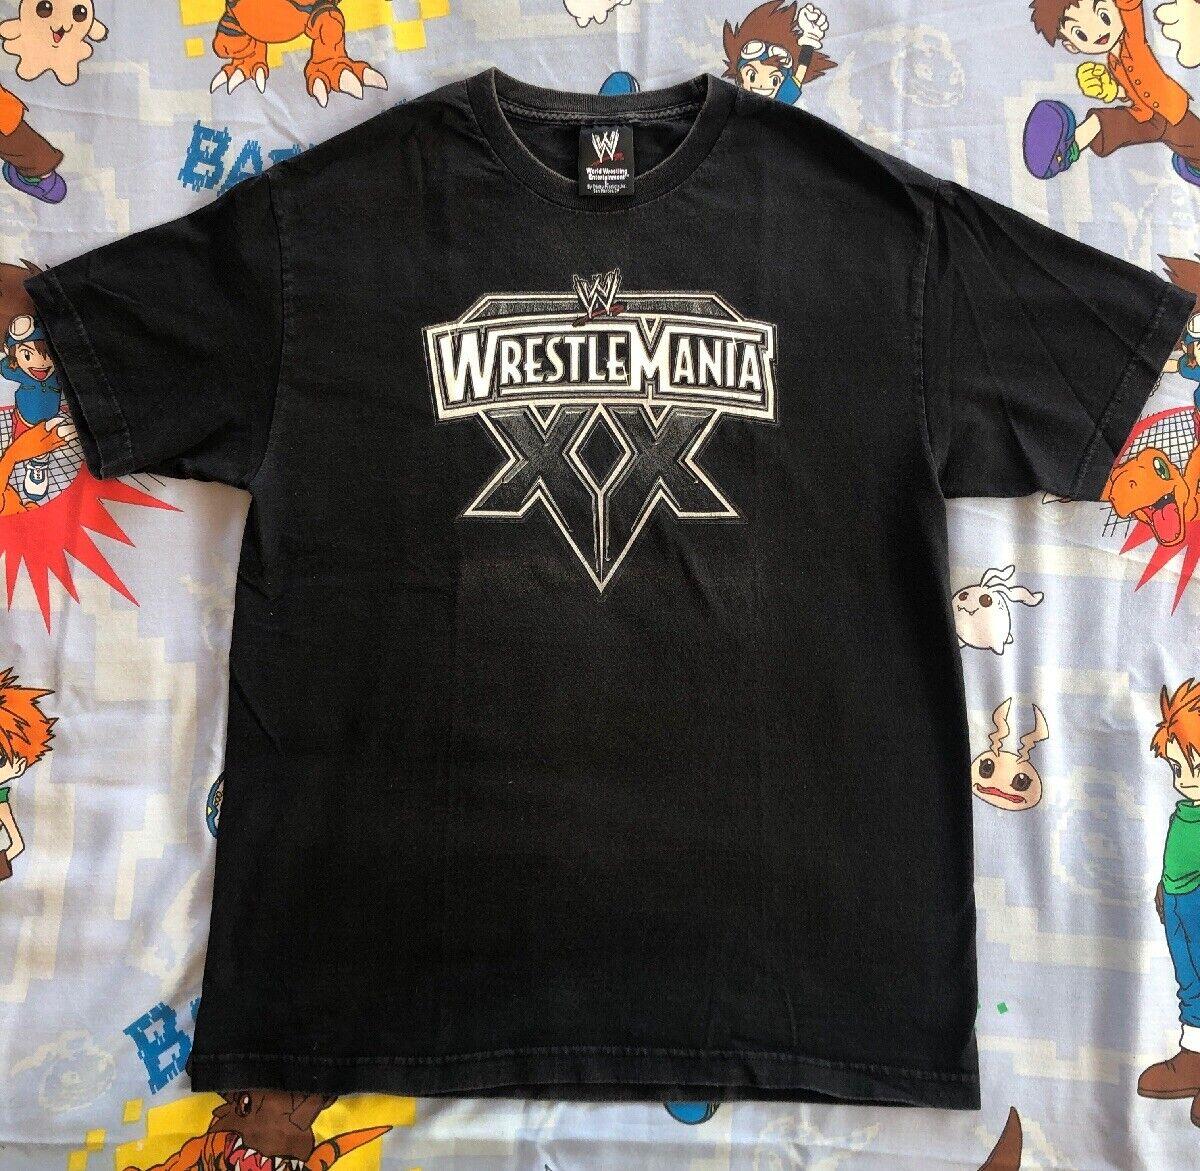 Wrestlemania XX 20 Benoit HHH wrestling VTG original large WWF WWE 2004 MSG